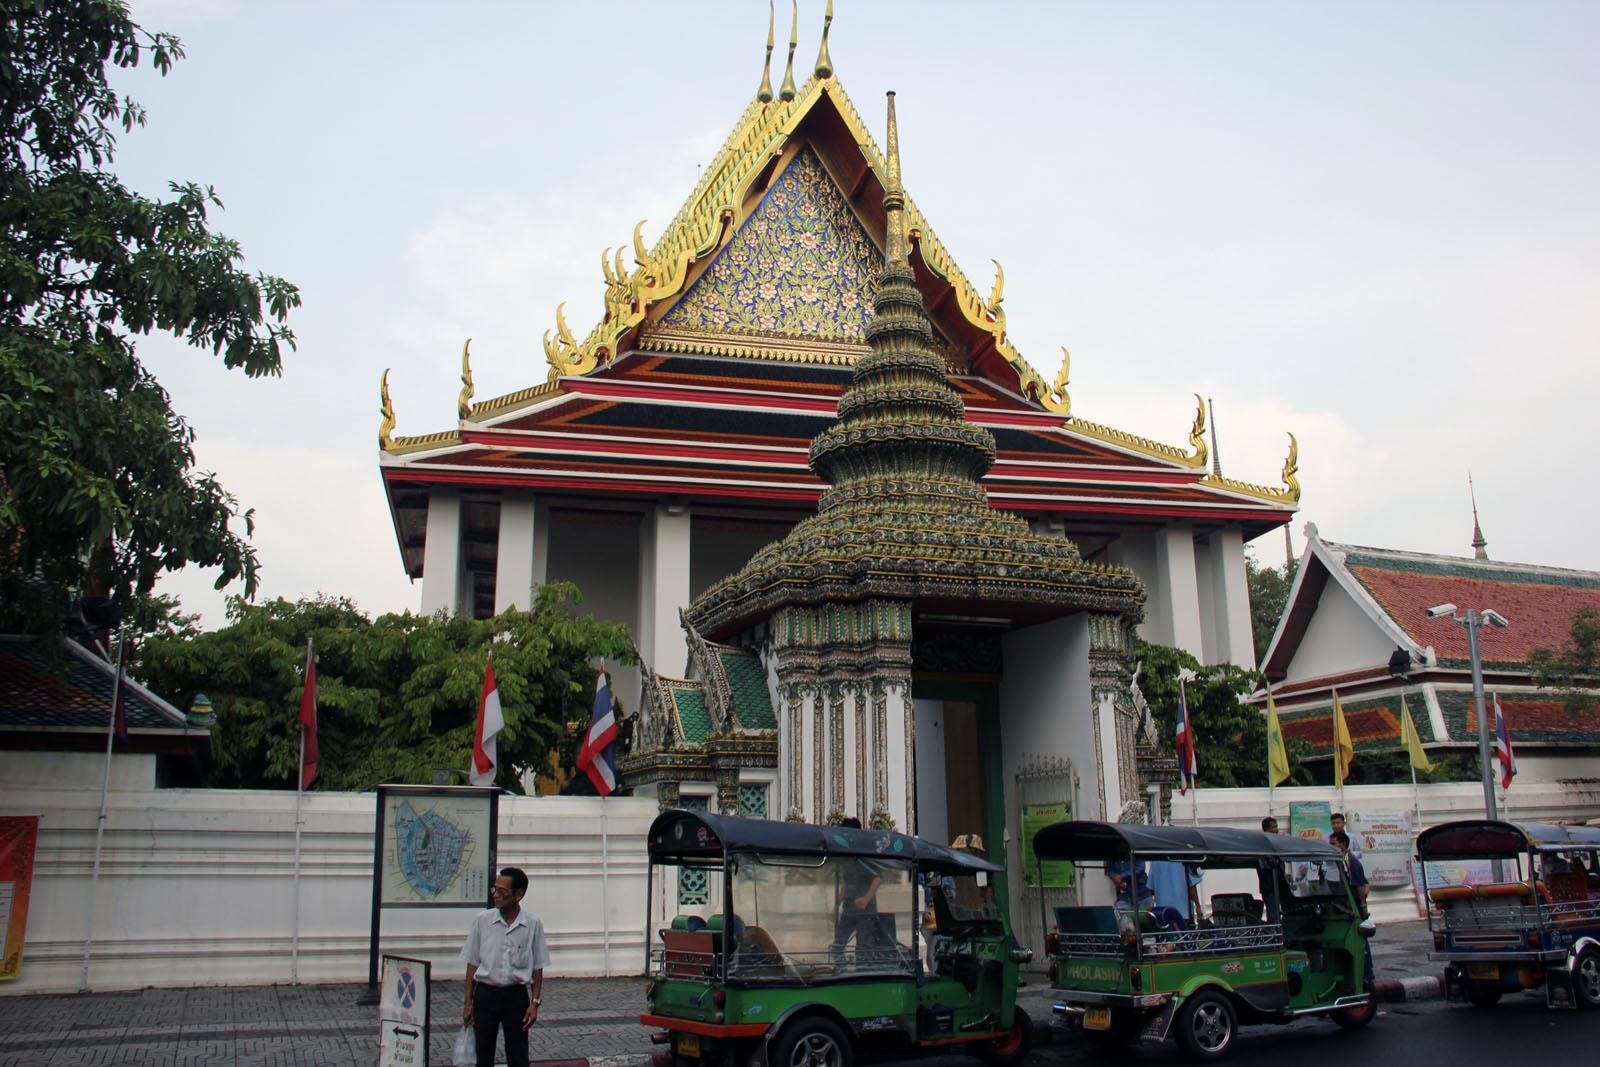 Reclining Buddha Temple in Bangkok & Wat Pho Temple of Reclining Buddha - Thailand islam-shia.org